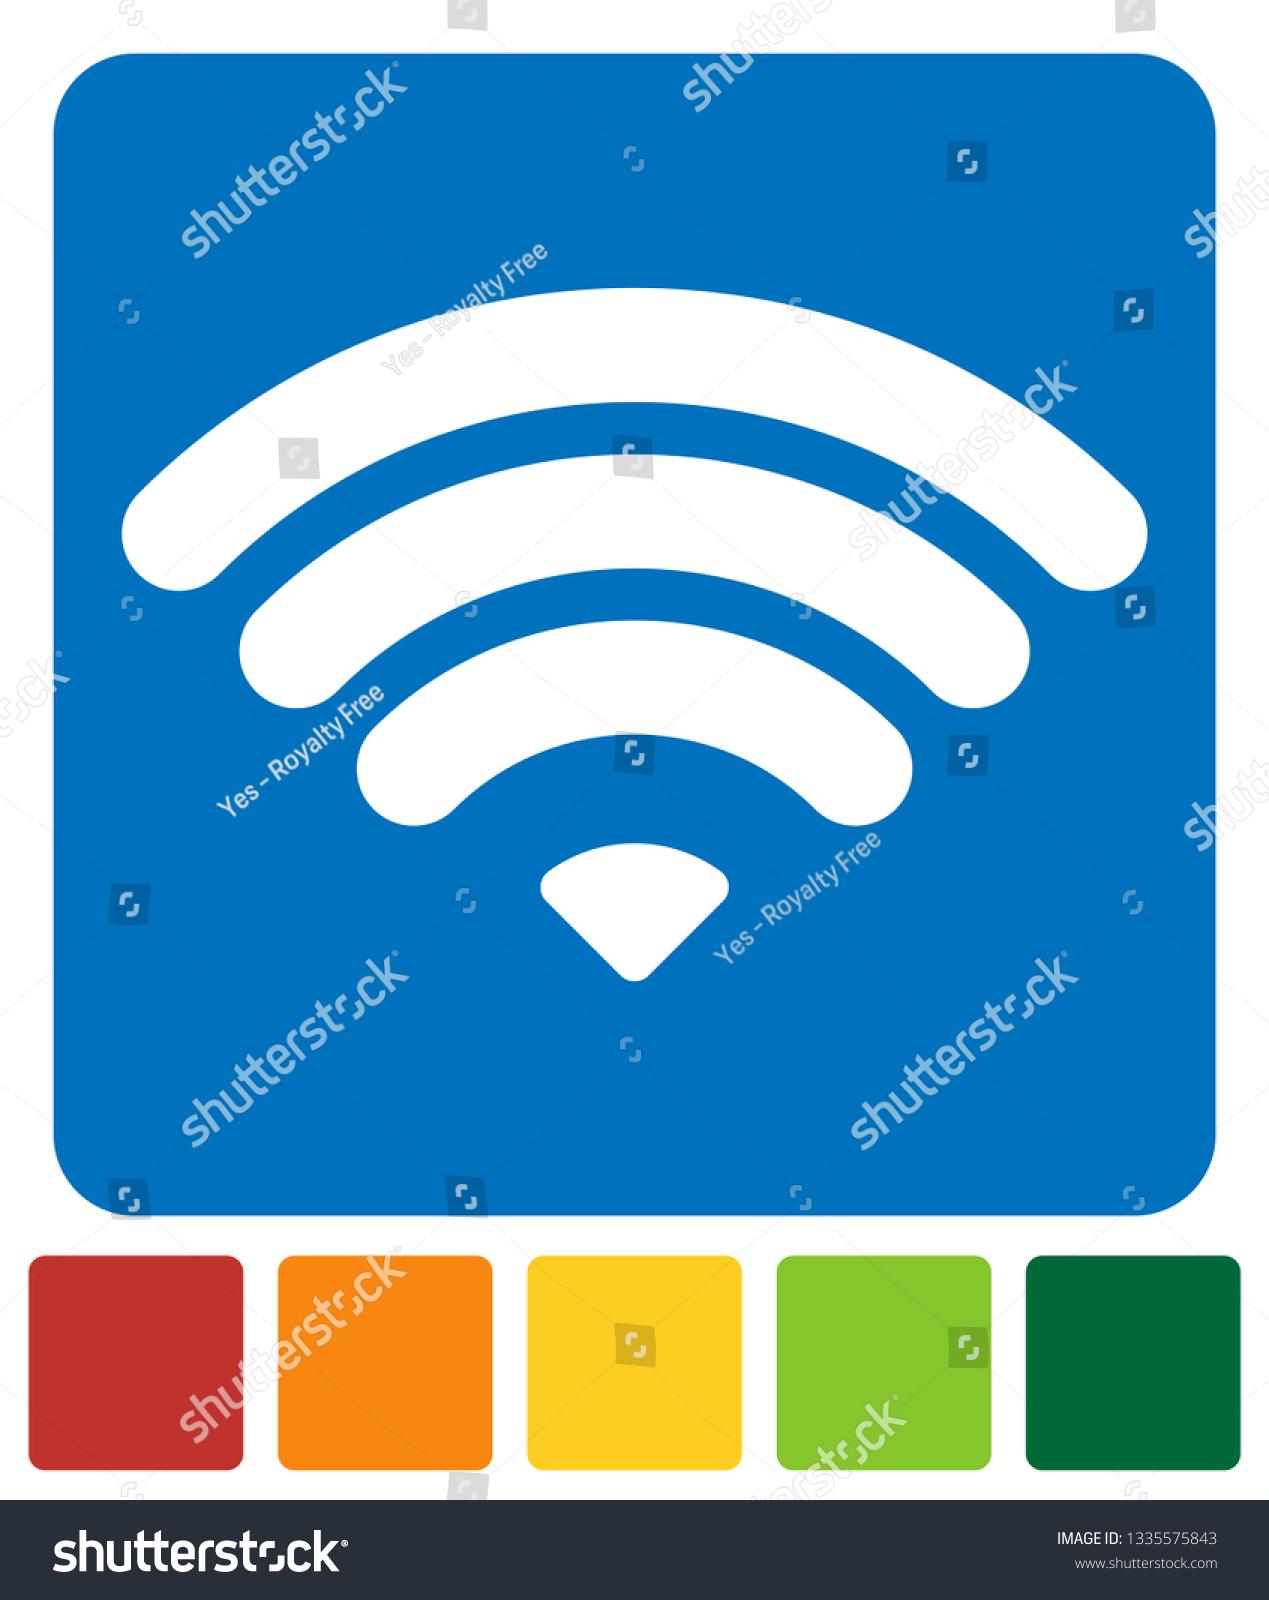 Free Spreading Pics icon centric radial lines spread spreading stock vector